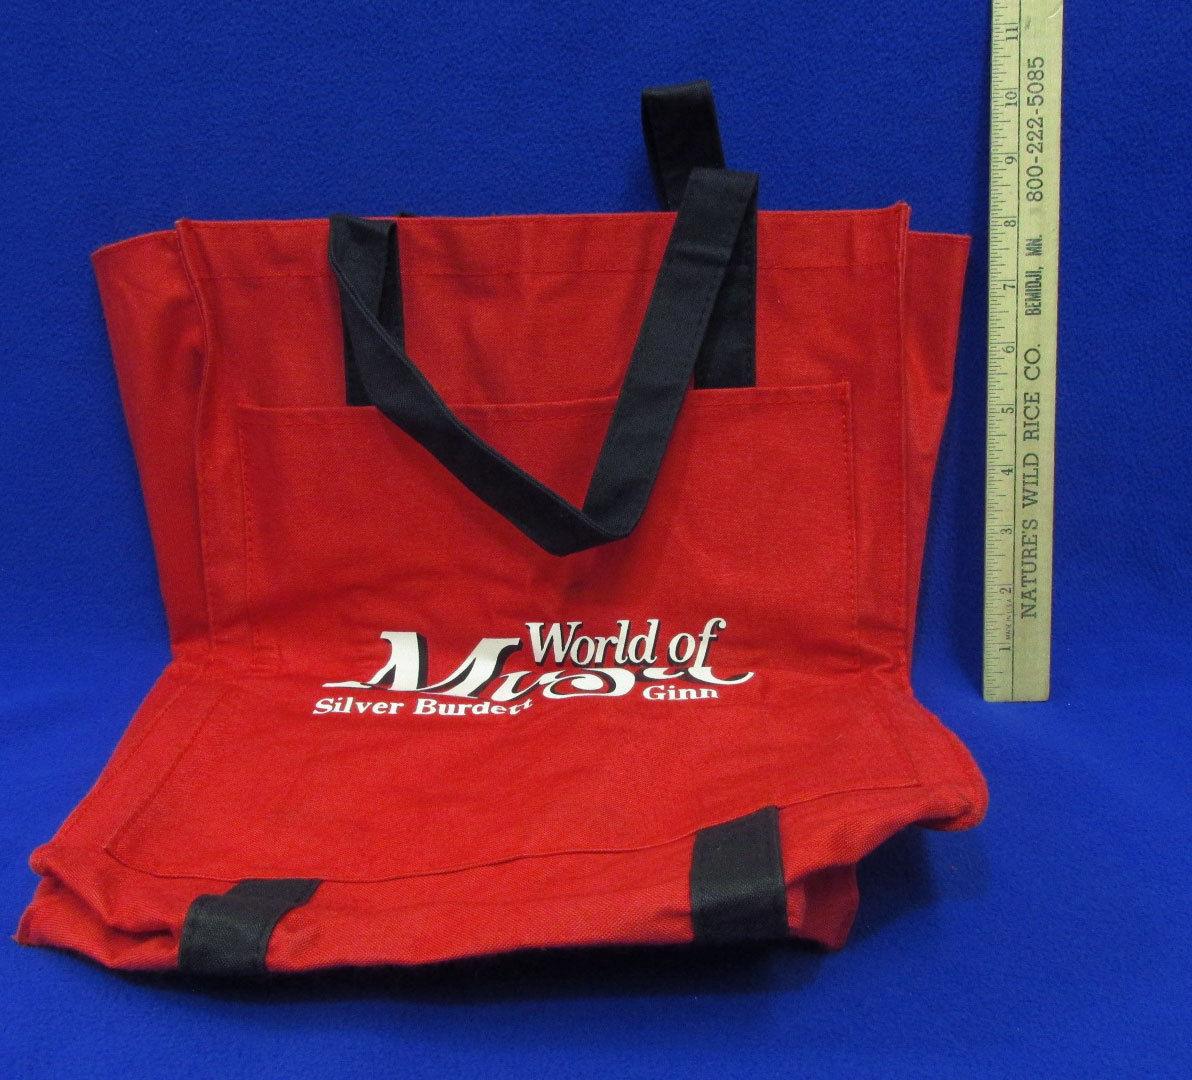 Silver Burdett Ginn World Of Music Tote Bag Carrying Case Red w/ Black Handles